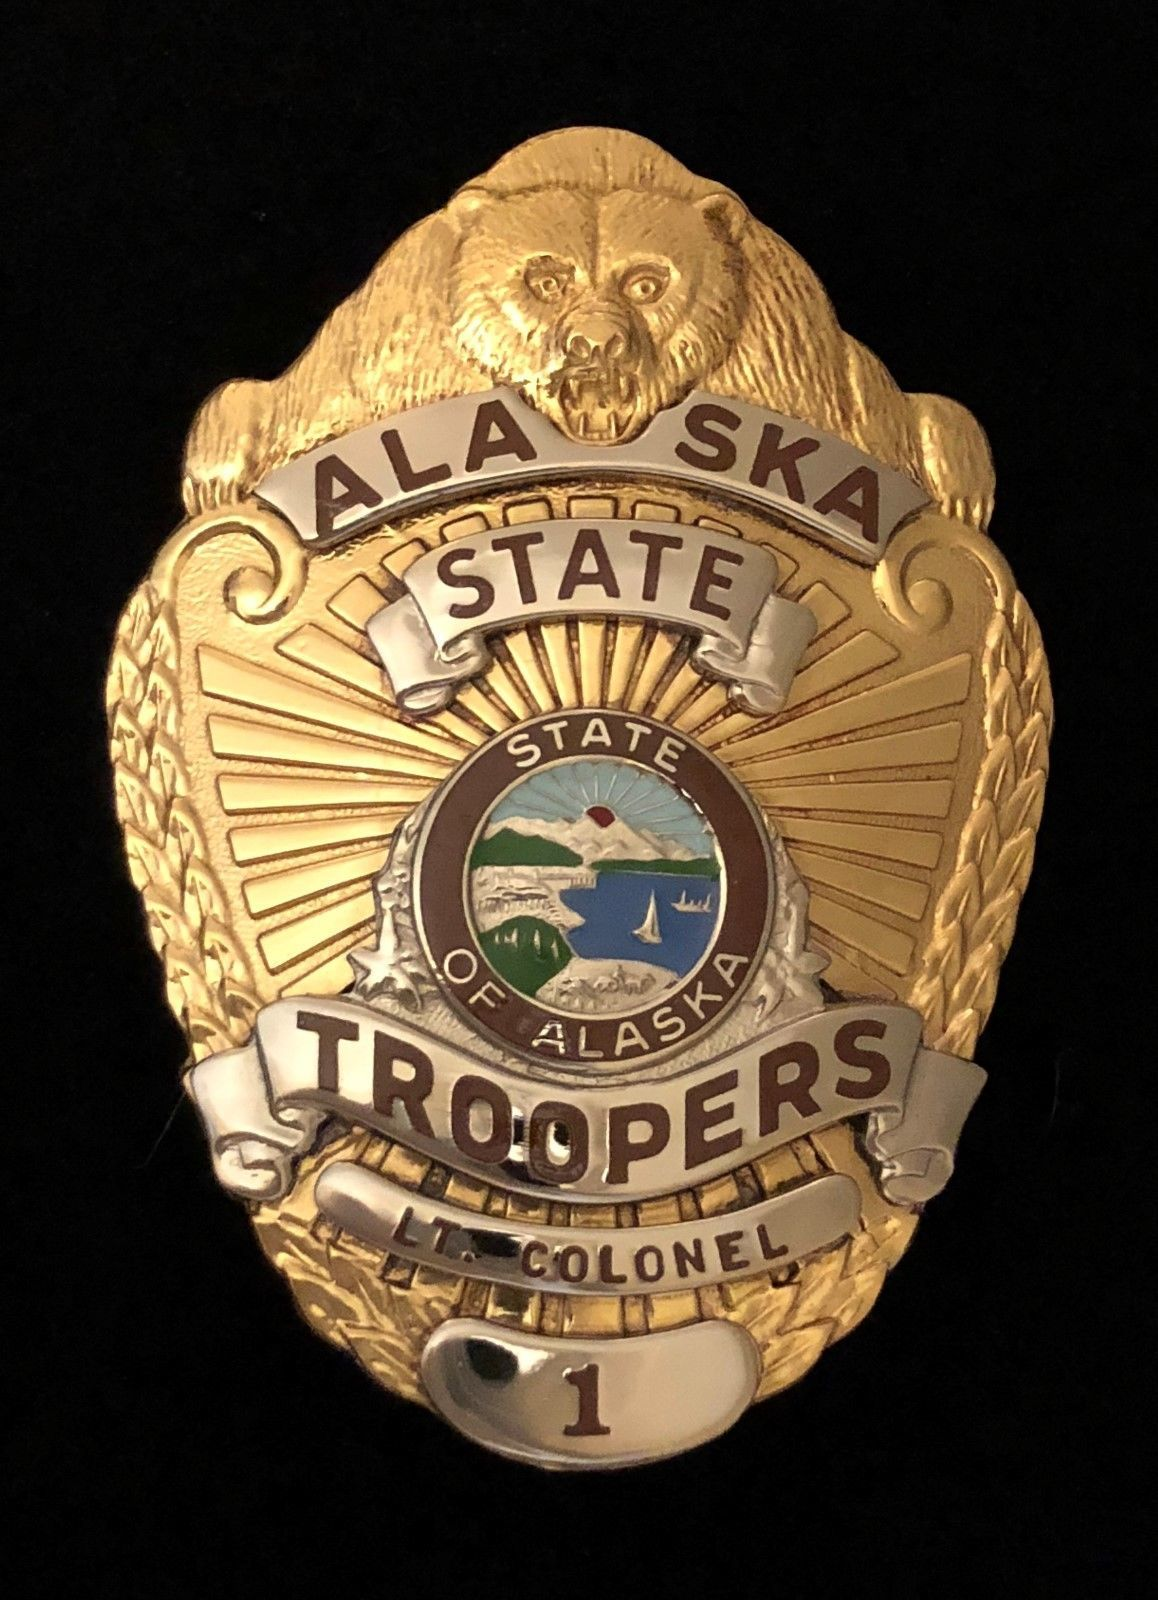 Lieutenant Colonel, Alaska States Troopers (Entenmann